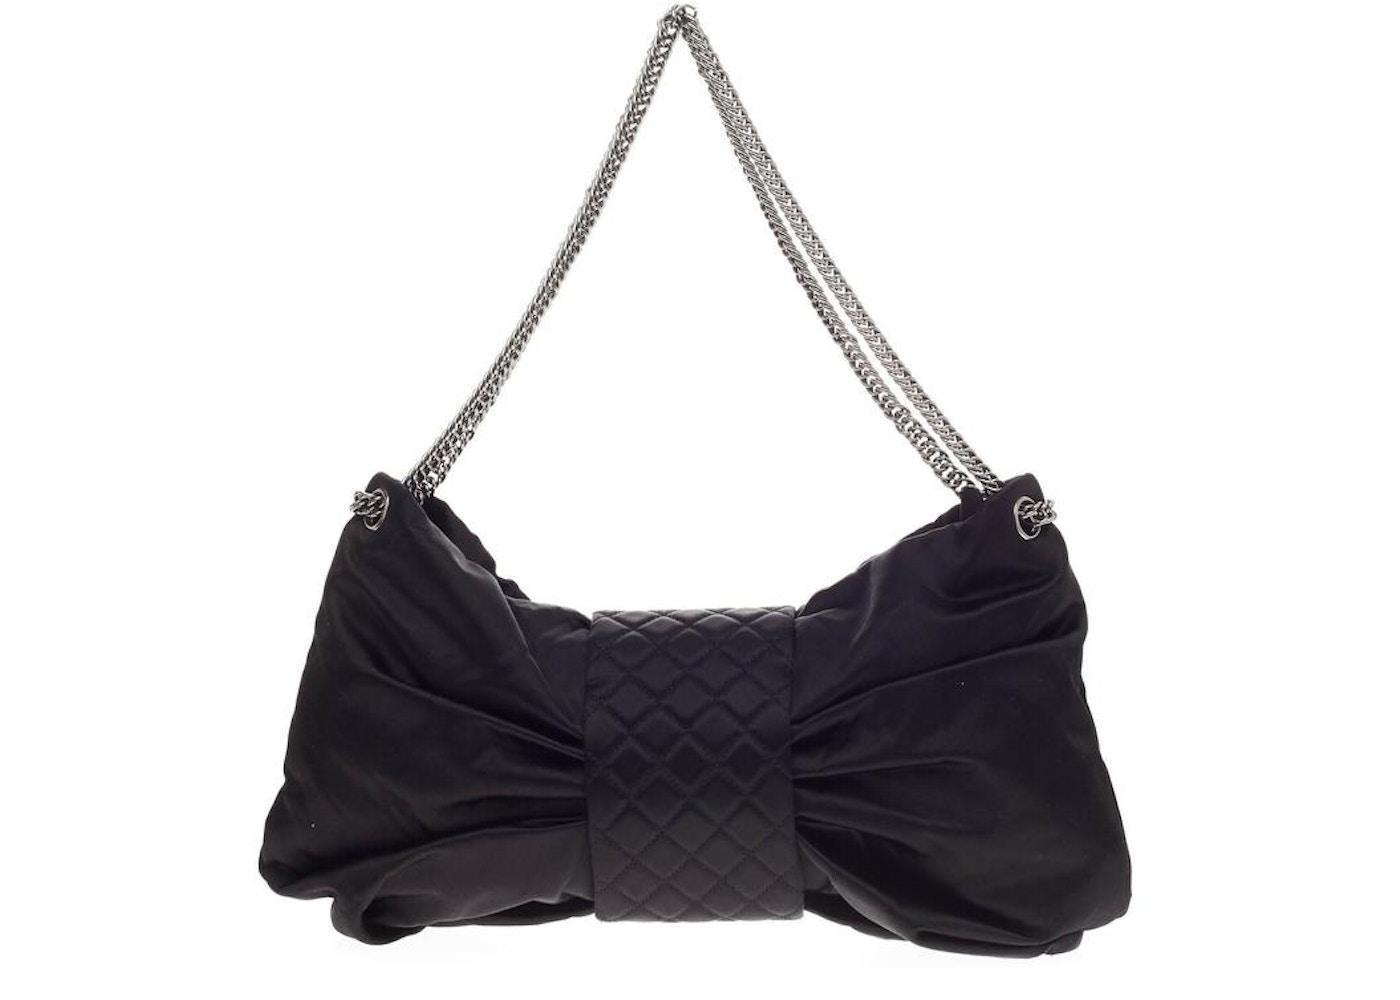 6e852824f1e0 Buy   Sell Luxury Handbags - New Lowest Asks